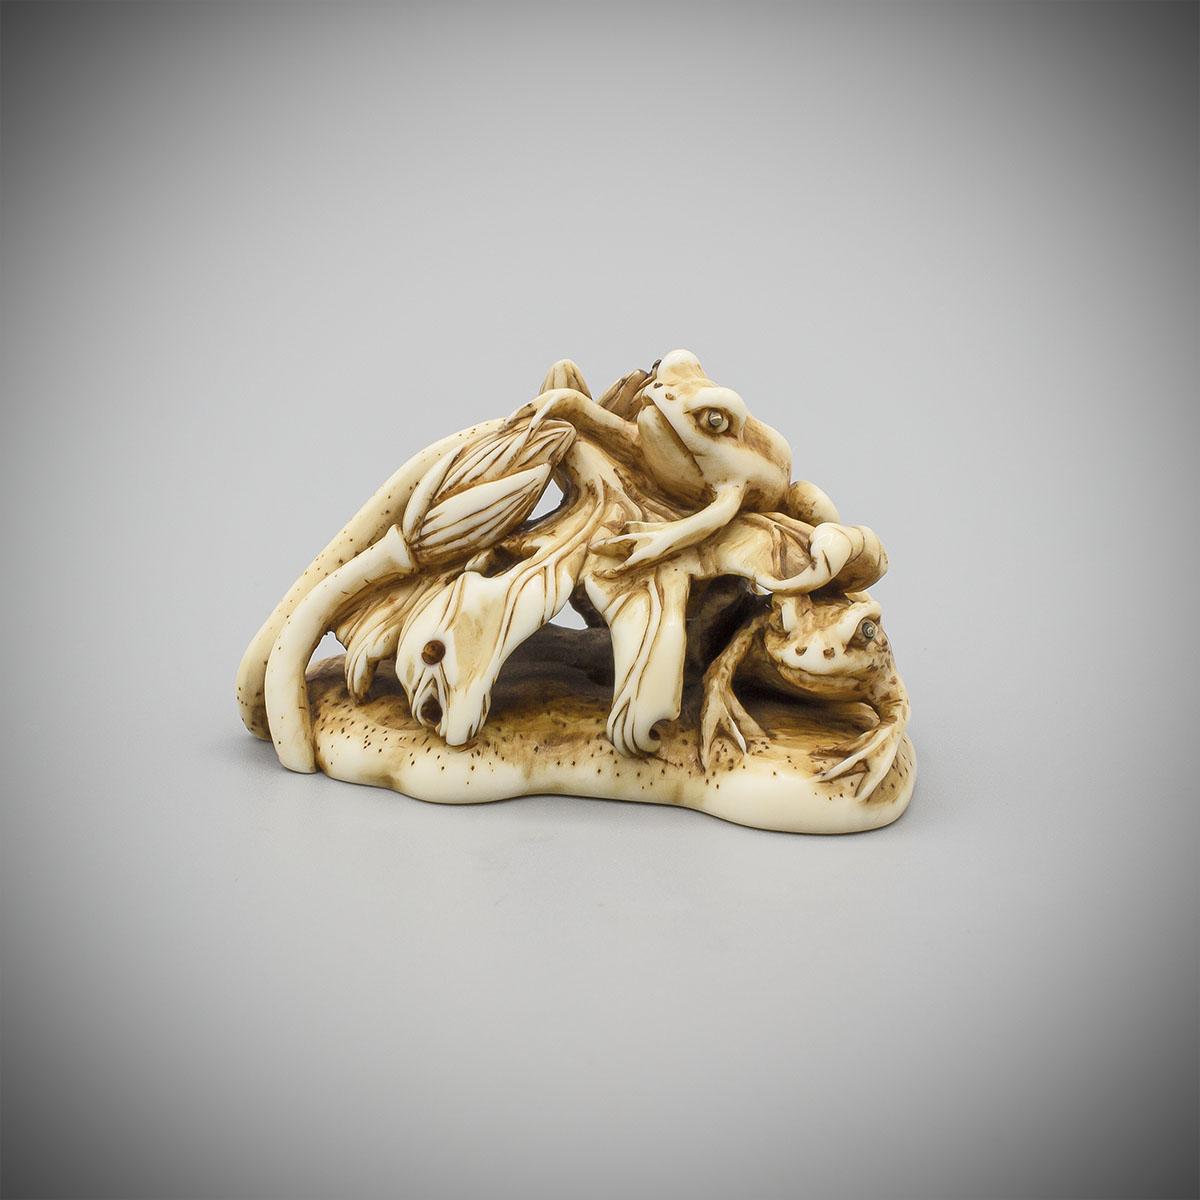 Ivory Netsuke of Two Frogs and Lotus, attributed to Okazaki Rensai, MR3576_v.1-2